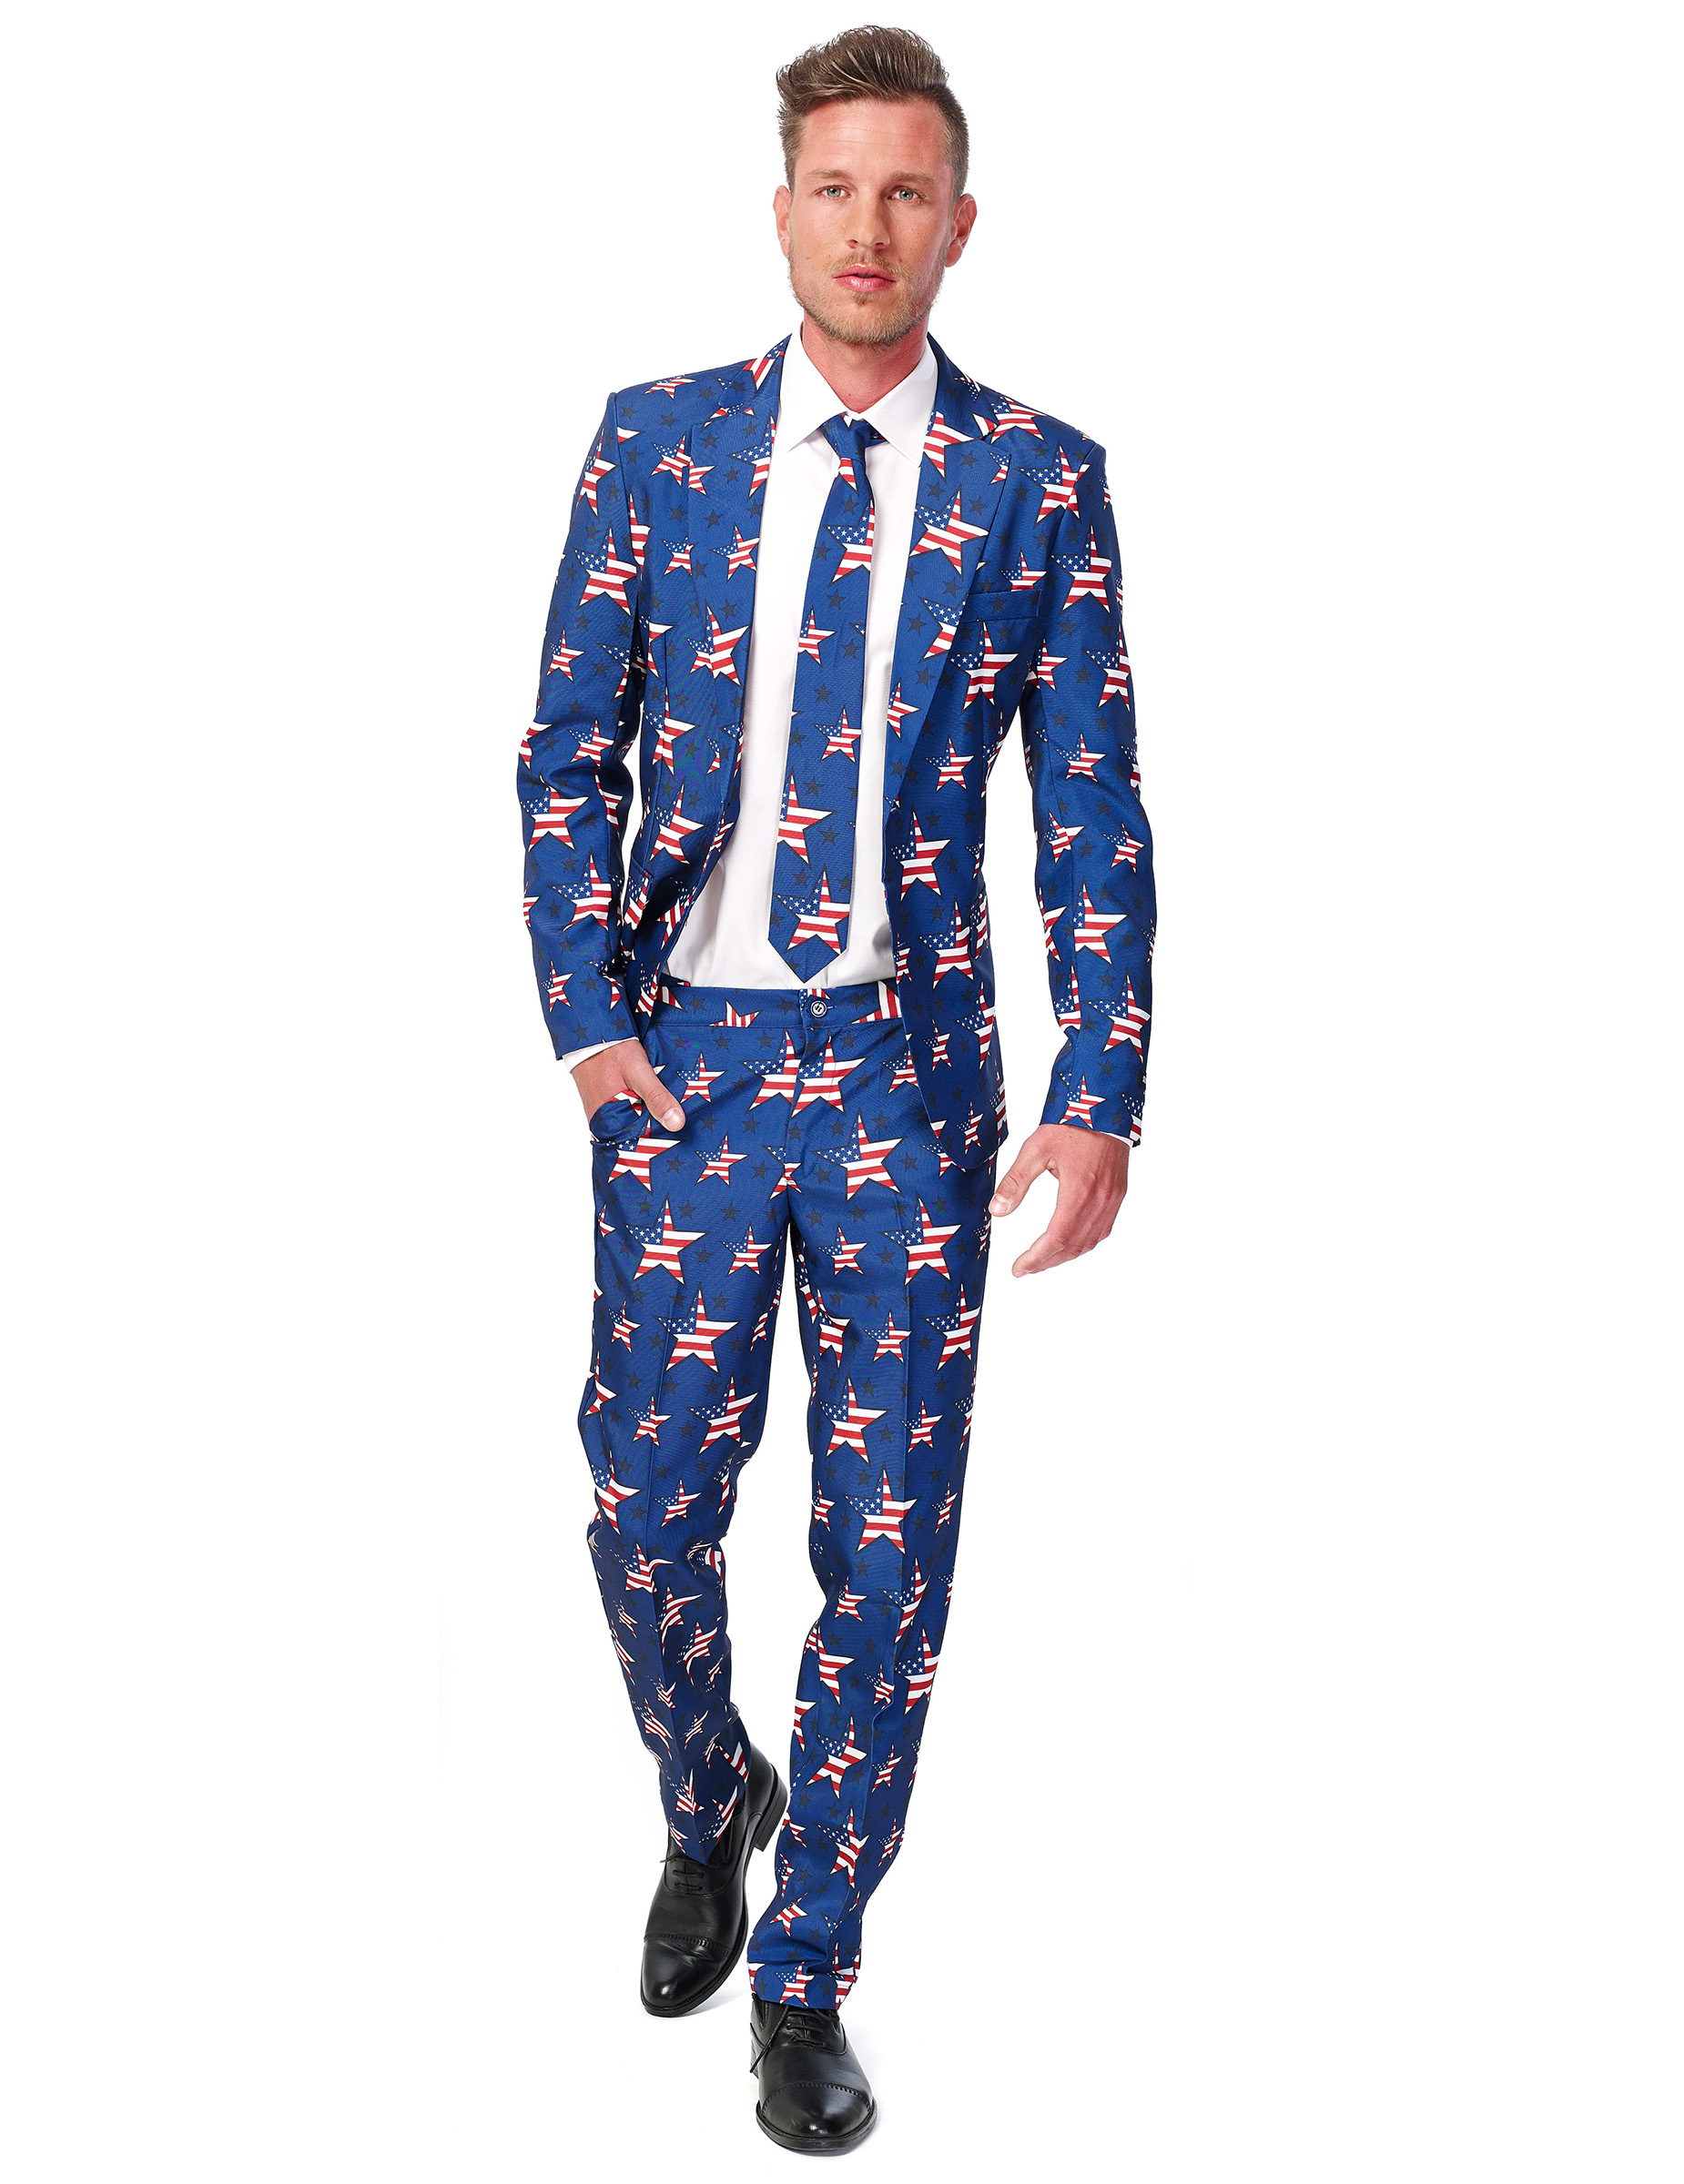 suitmeister anzug usa stars and stripes blau rot weiss g nstige faschings kost me bei karneval. Black Bedroom Furniture Sets. Home Design Ideas